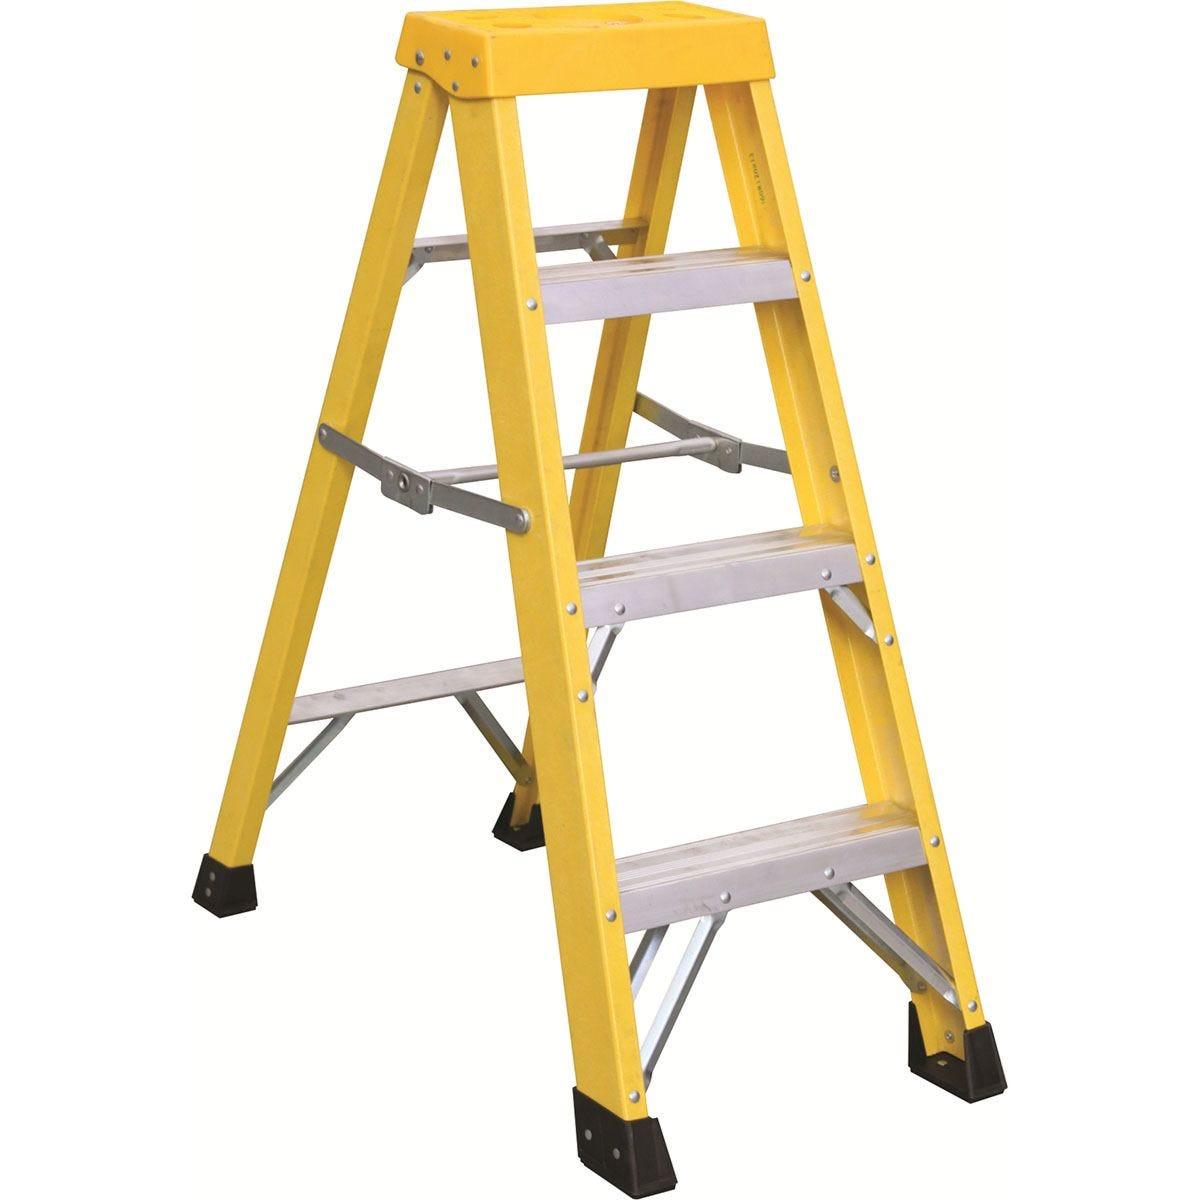 Draper Fibreglass 3 Step Ladder - Yellow